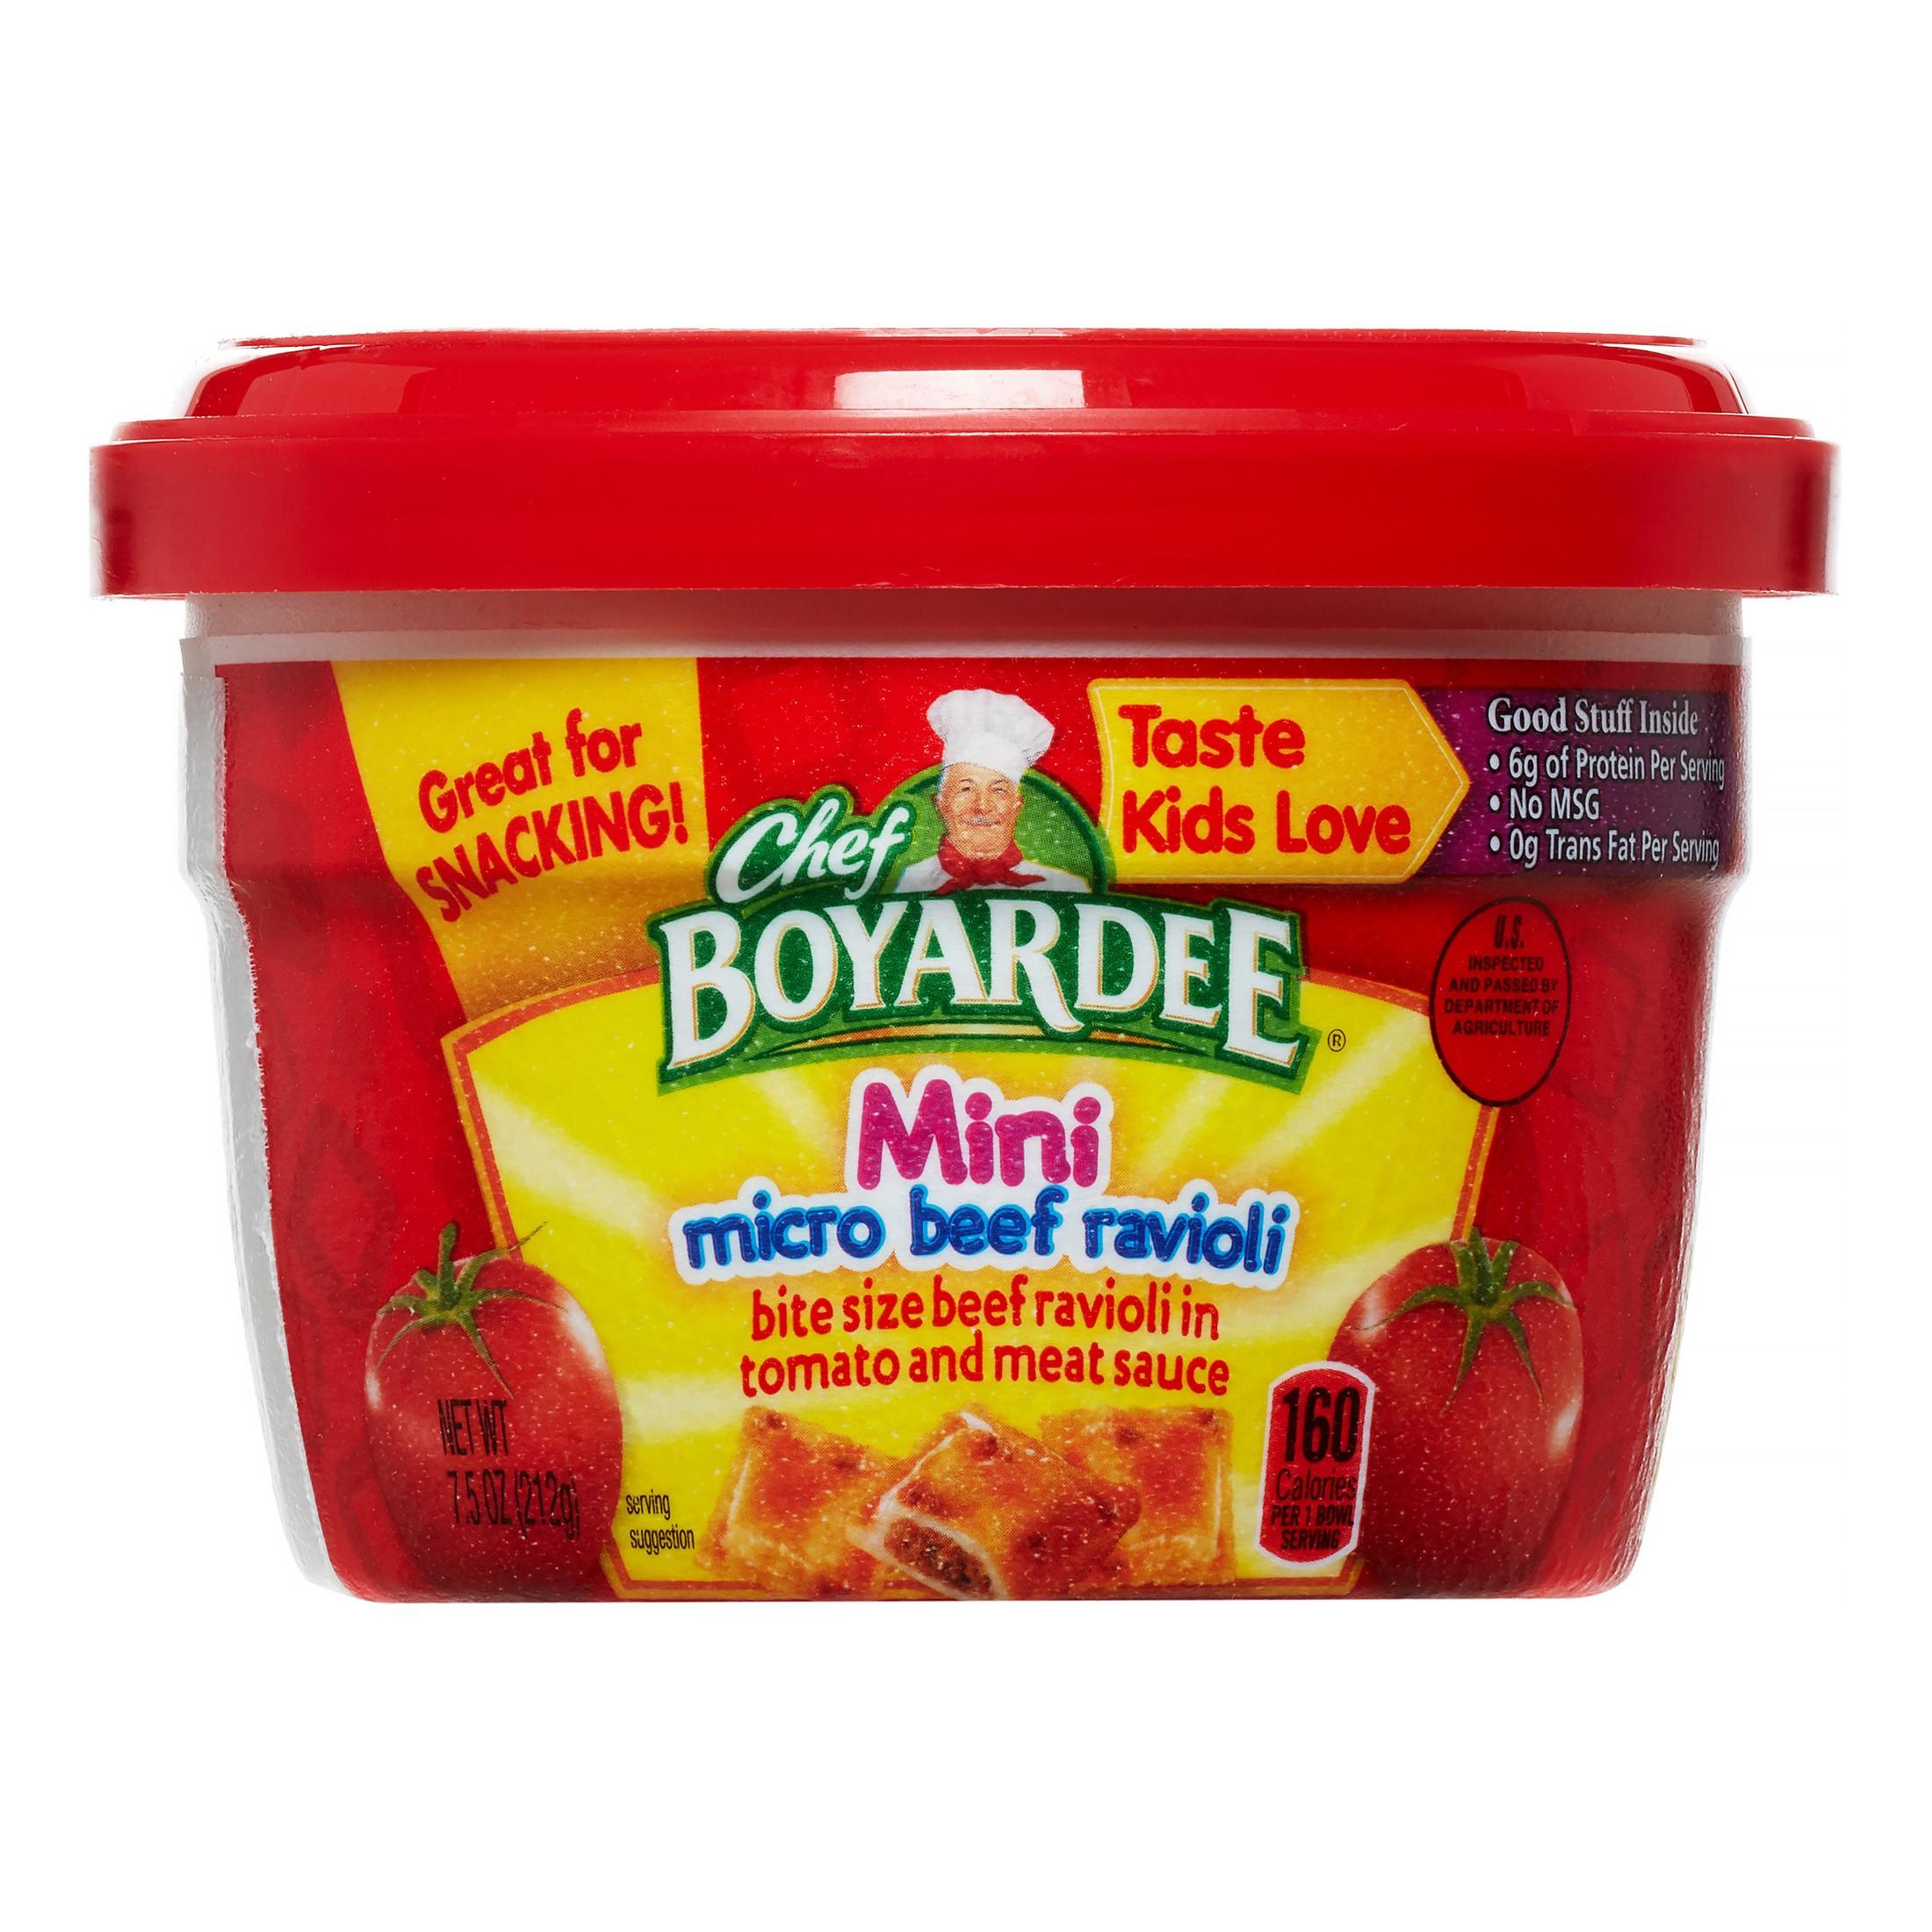 (8 Pack) Chef Boyardee Mini Micro Beef Ravioli, 7.5 oz